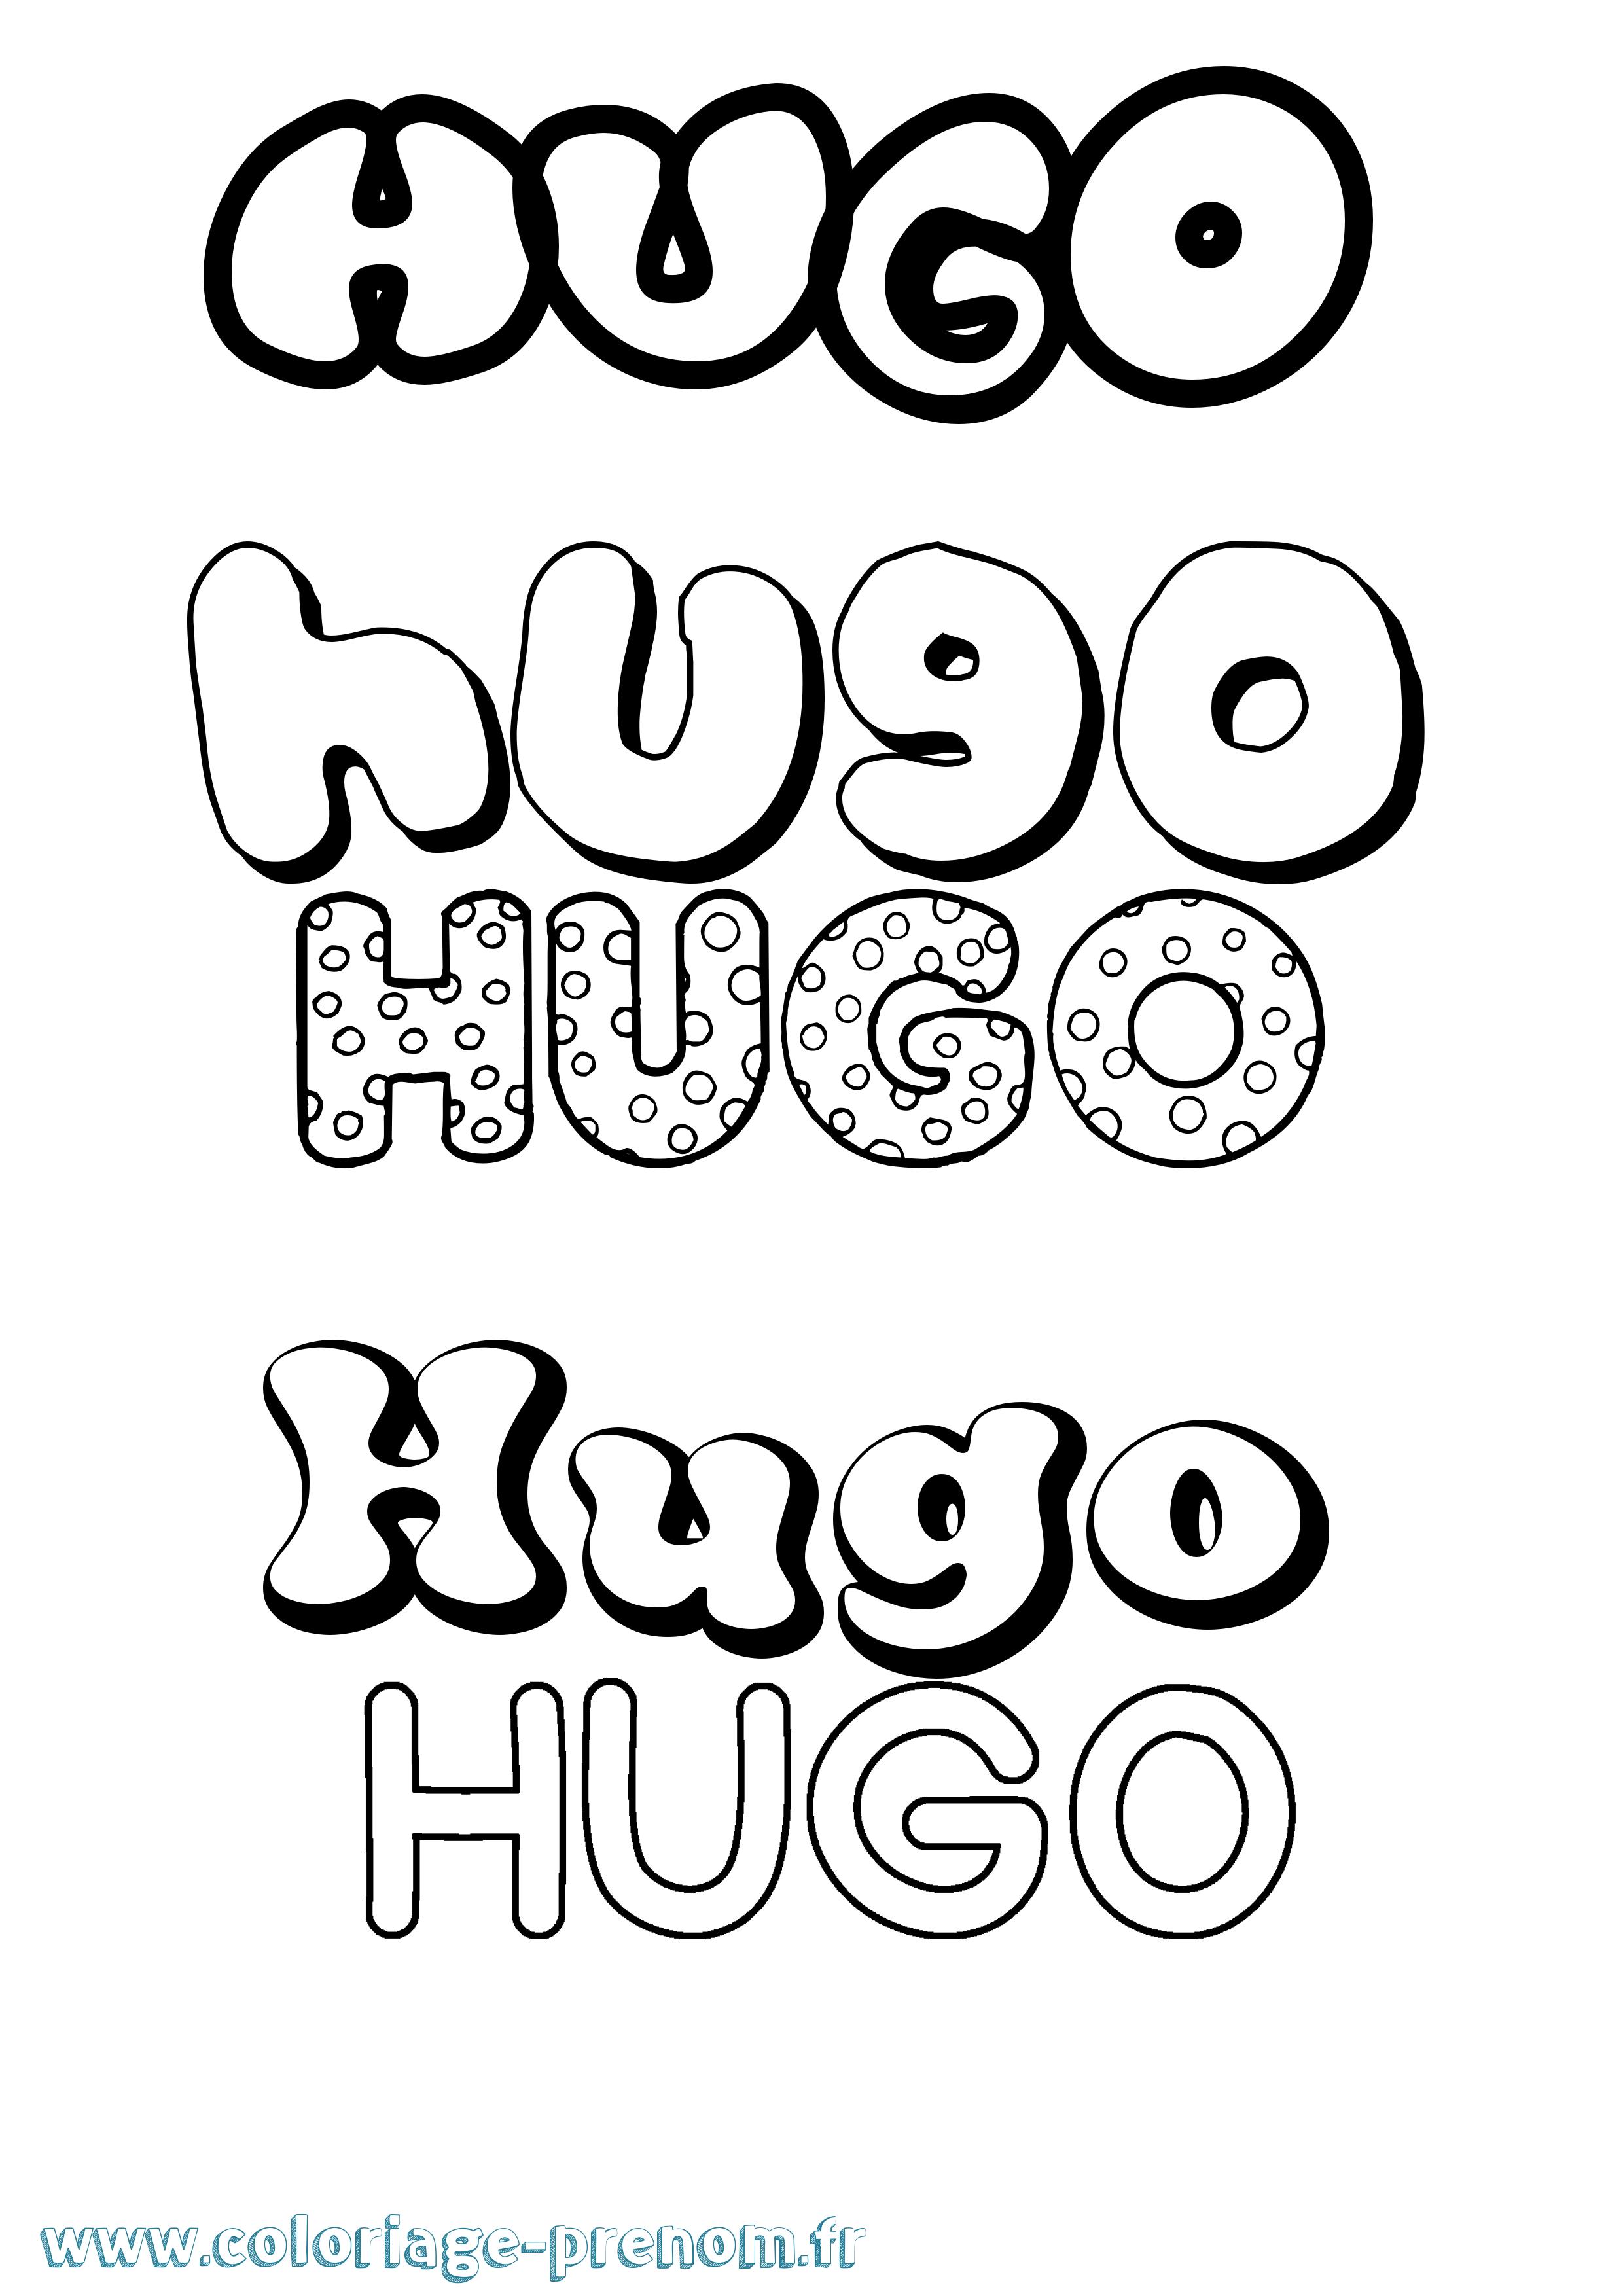 Coloriage prenom hugo www - Lulu l escargot coloriage ...